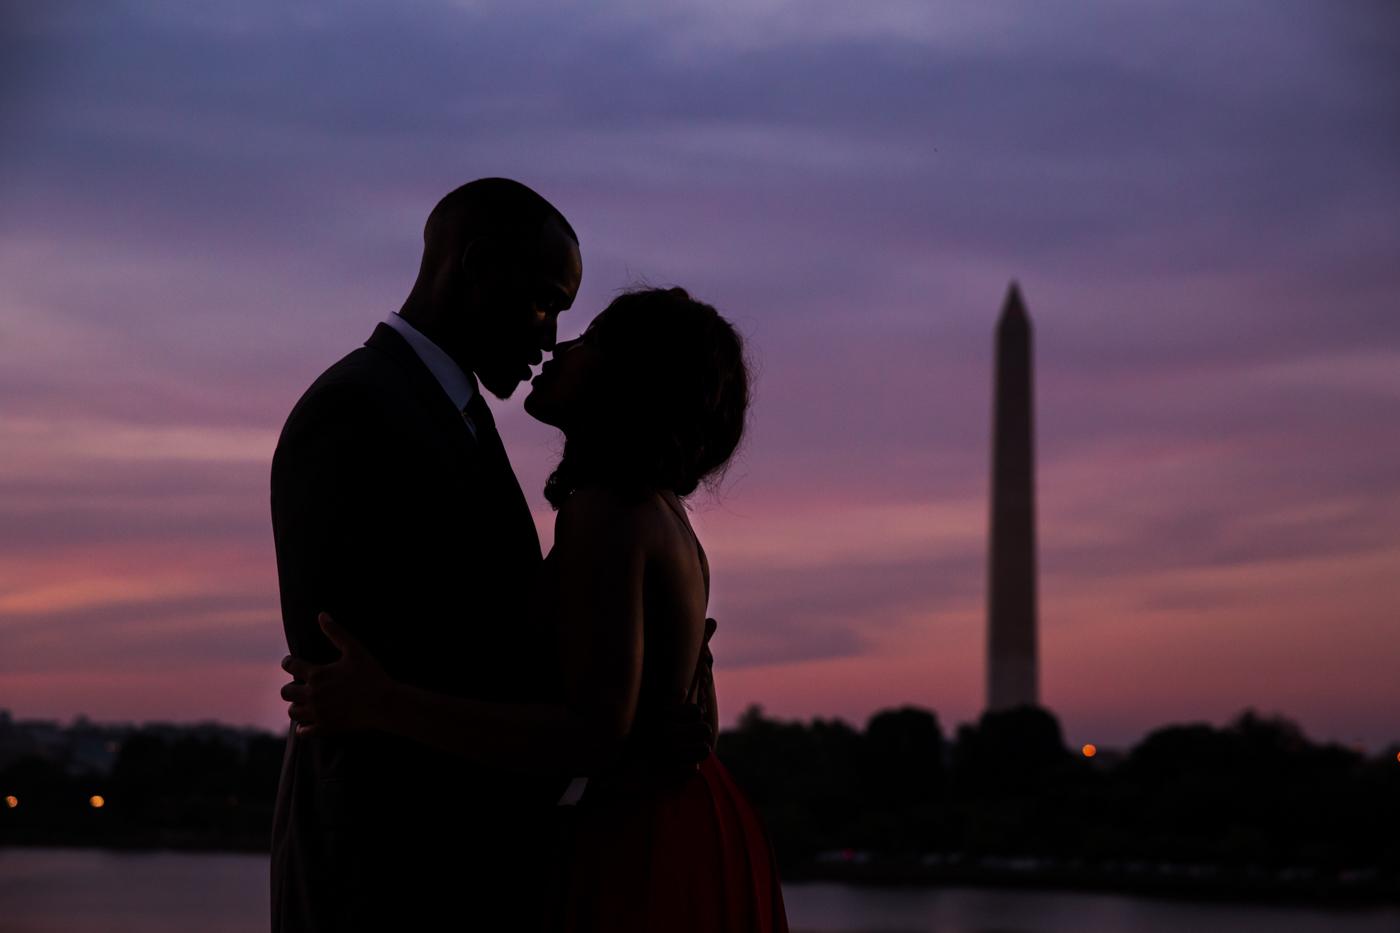 Jessica-Daniel-Engagement-Photo-Shoot-in-the-heart-of-Washington-DC-Ksenia-Pro-Photography-18